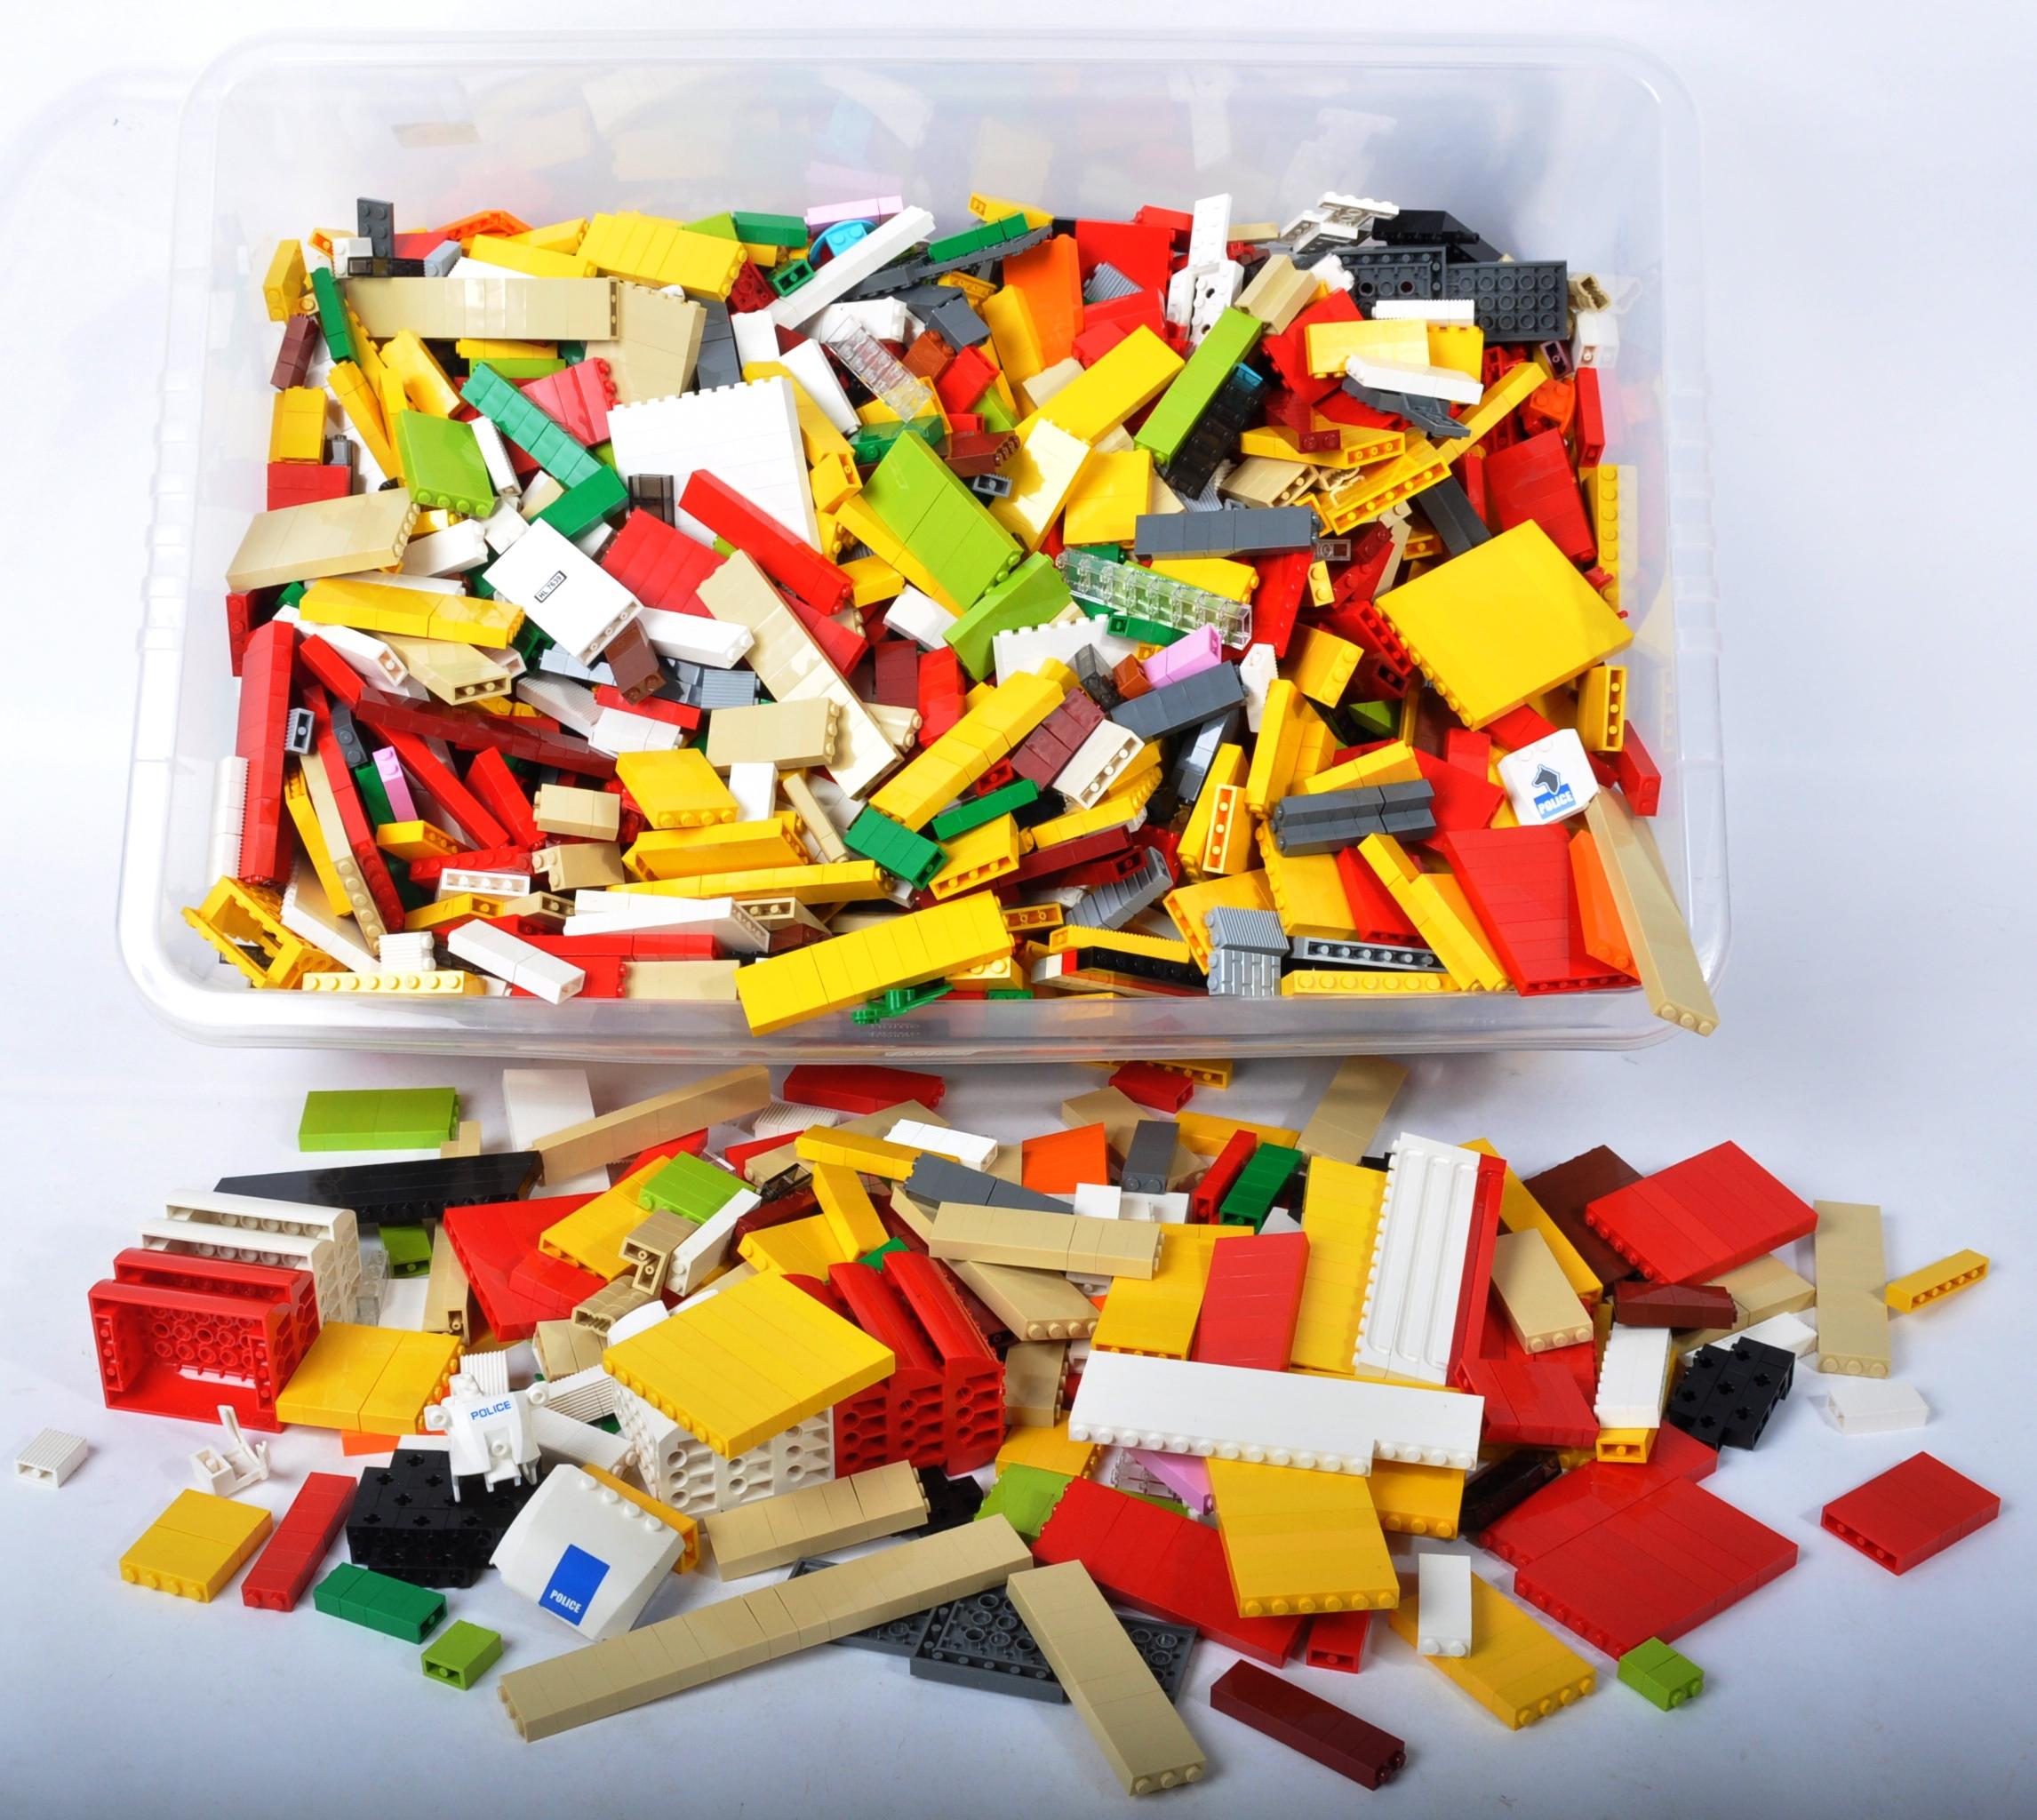 LARGE QUANTITY OF ASSORTED LOOSE LEGO BRICKS